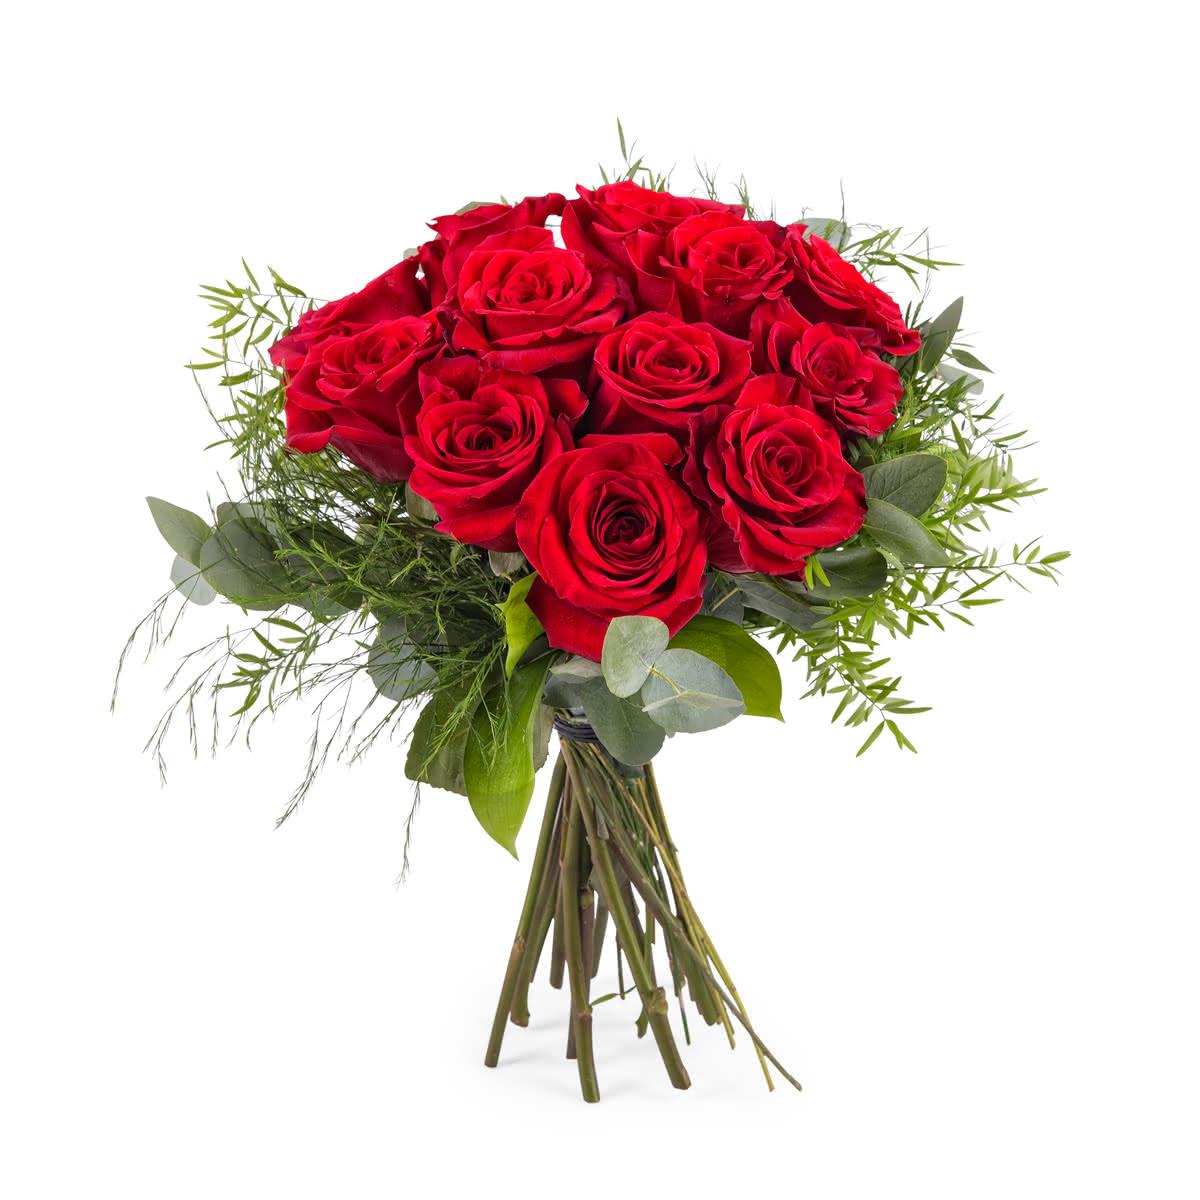 Deseo, 12 Rosas Rojas de Tallo Corto